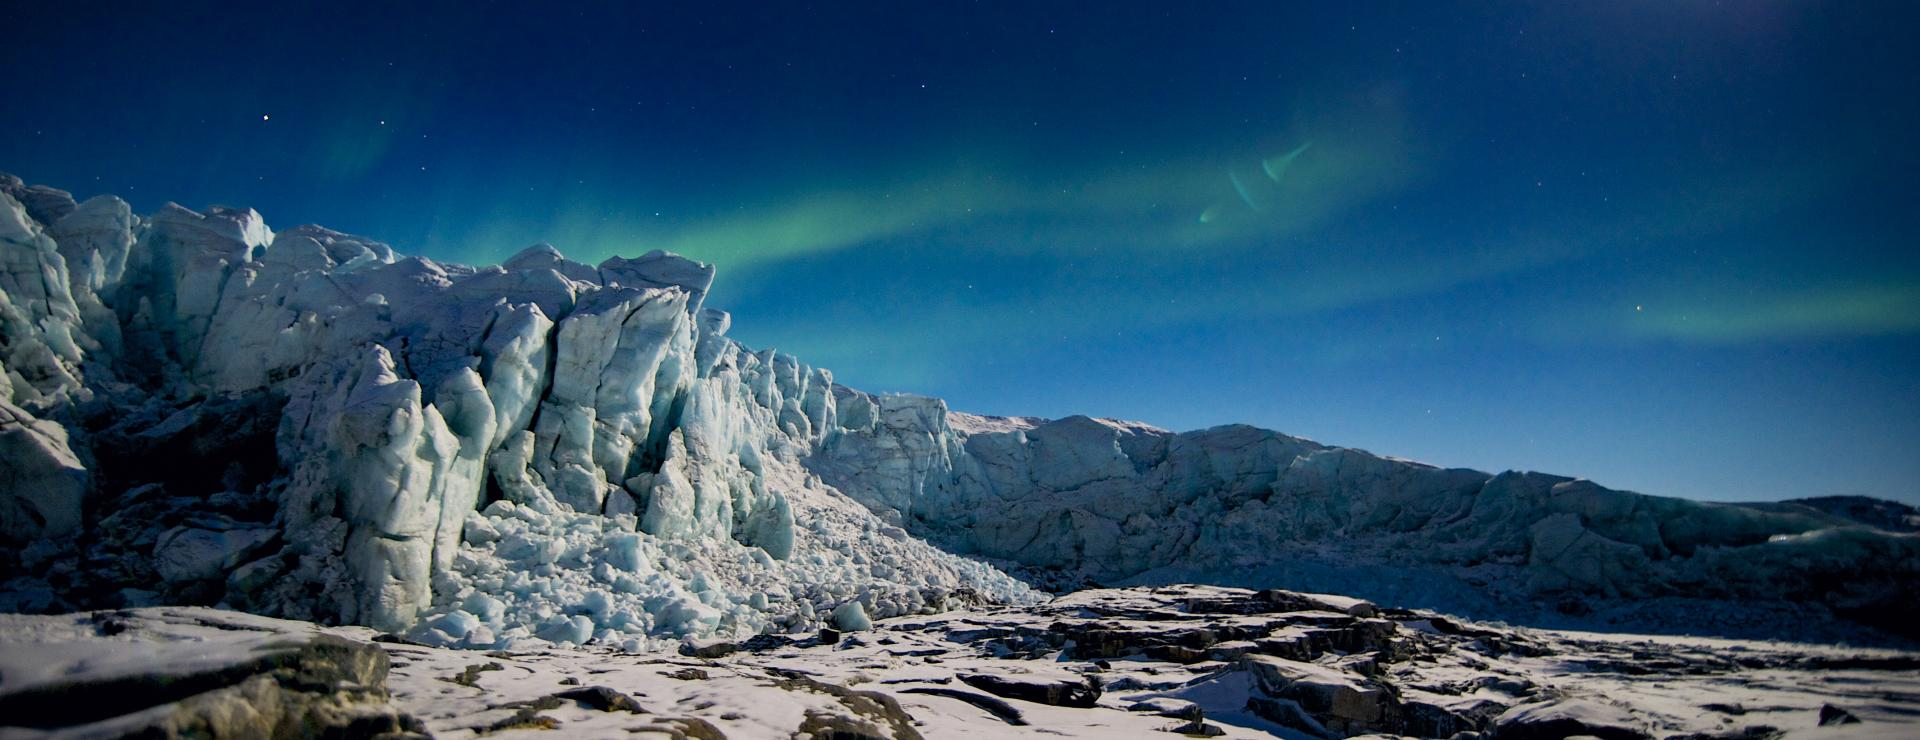 The local ice cap of Kangerlussuaq